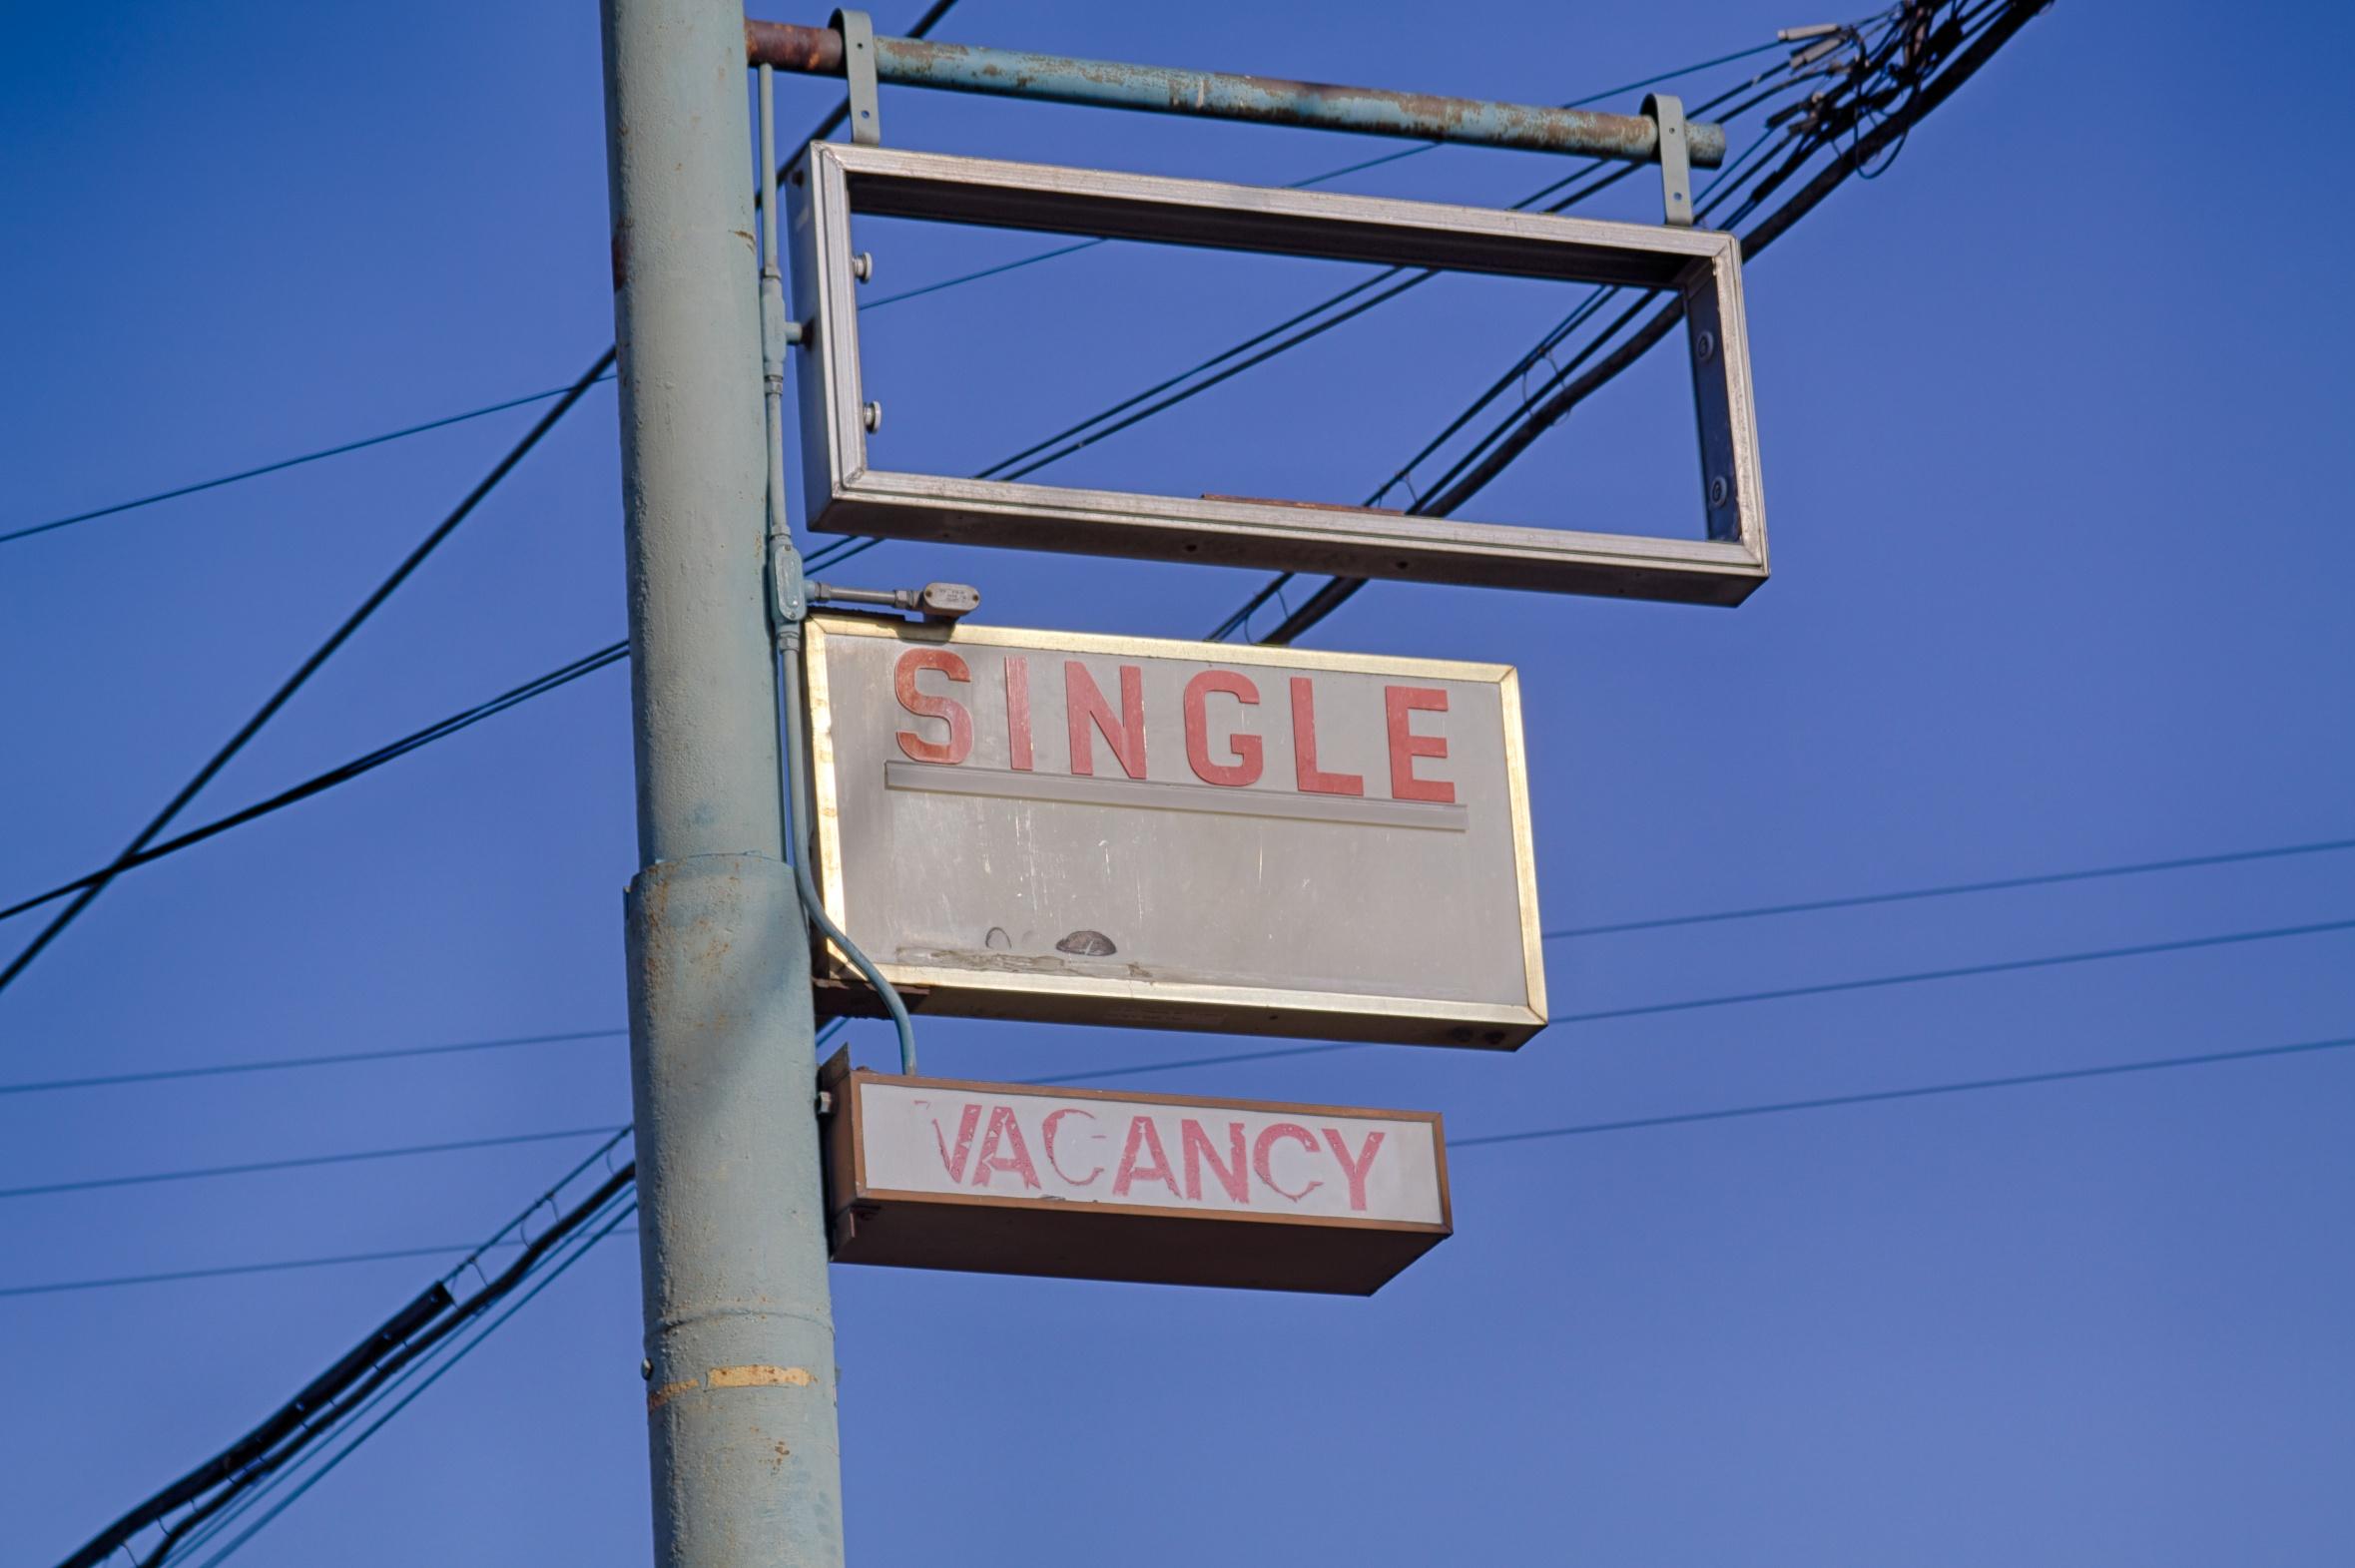 My sign...